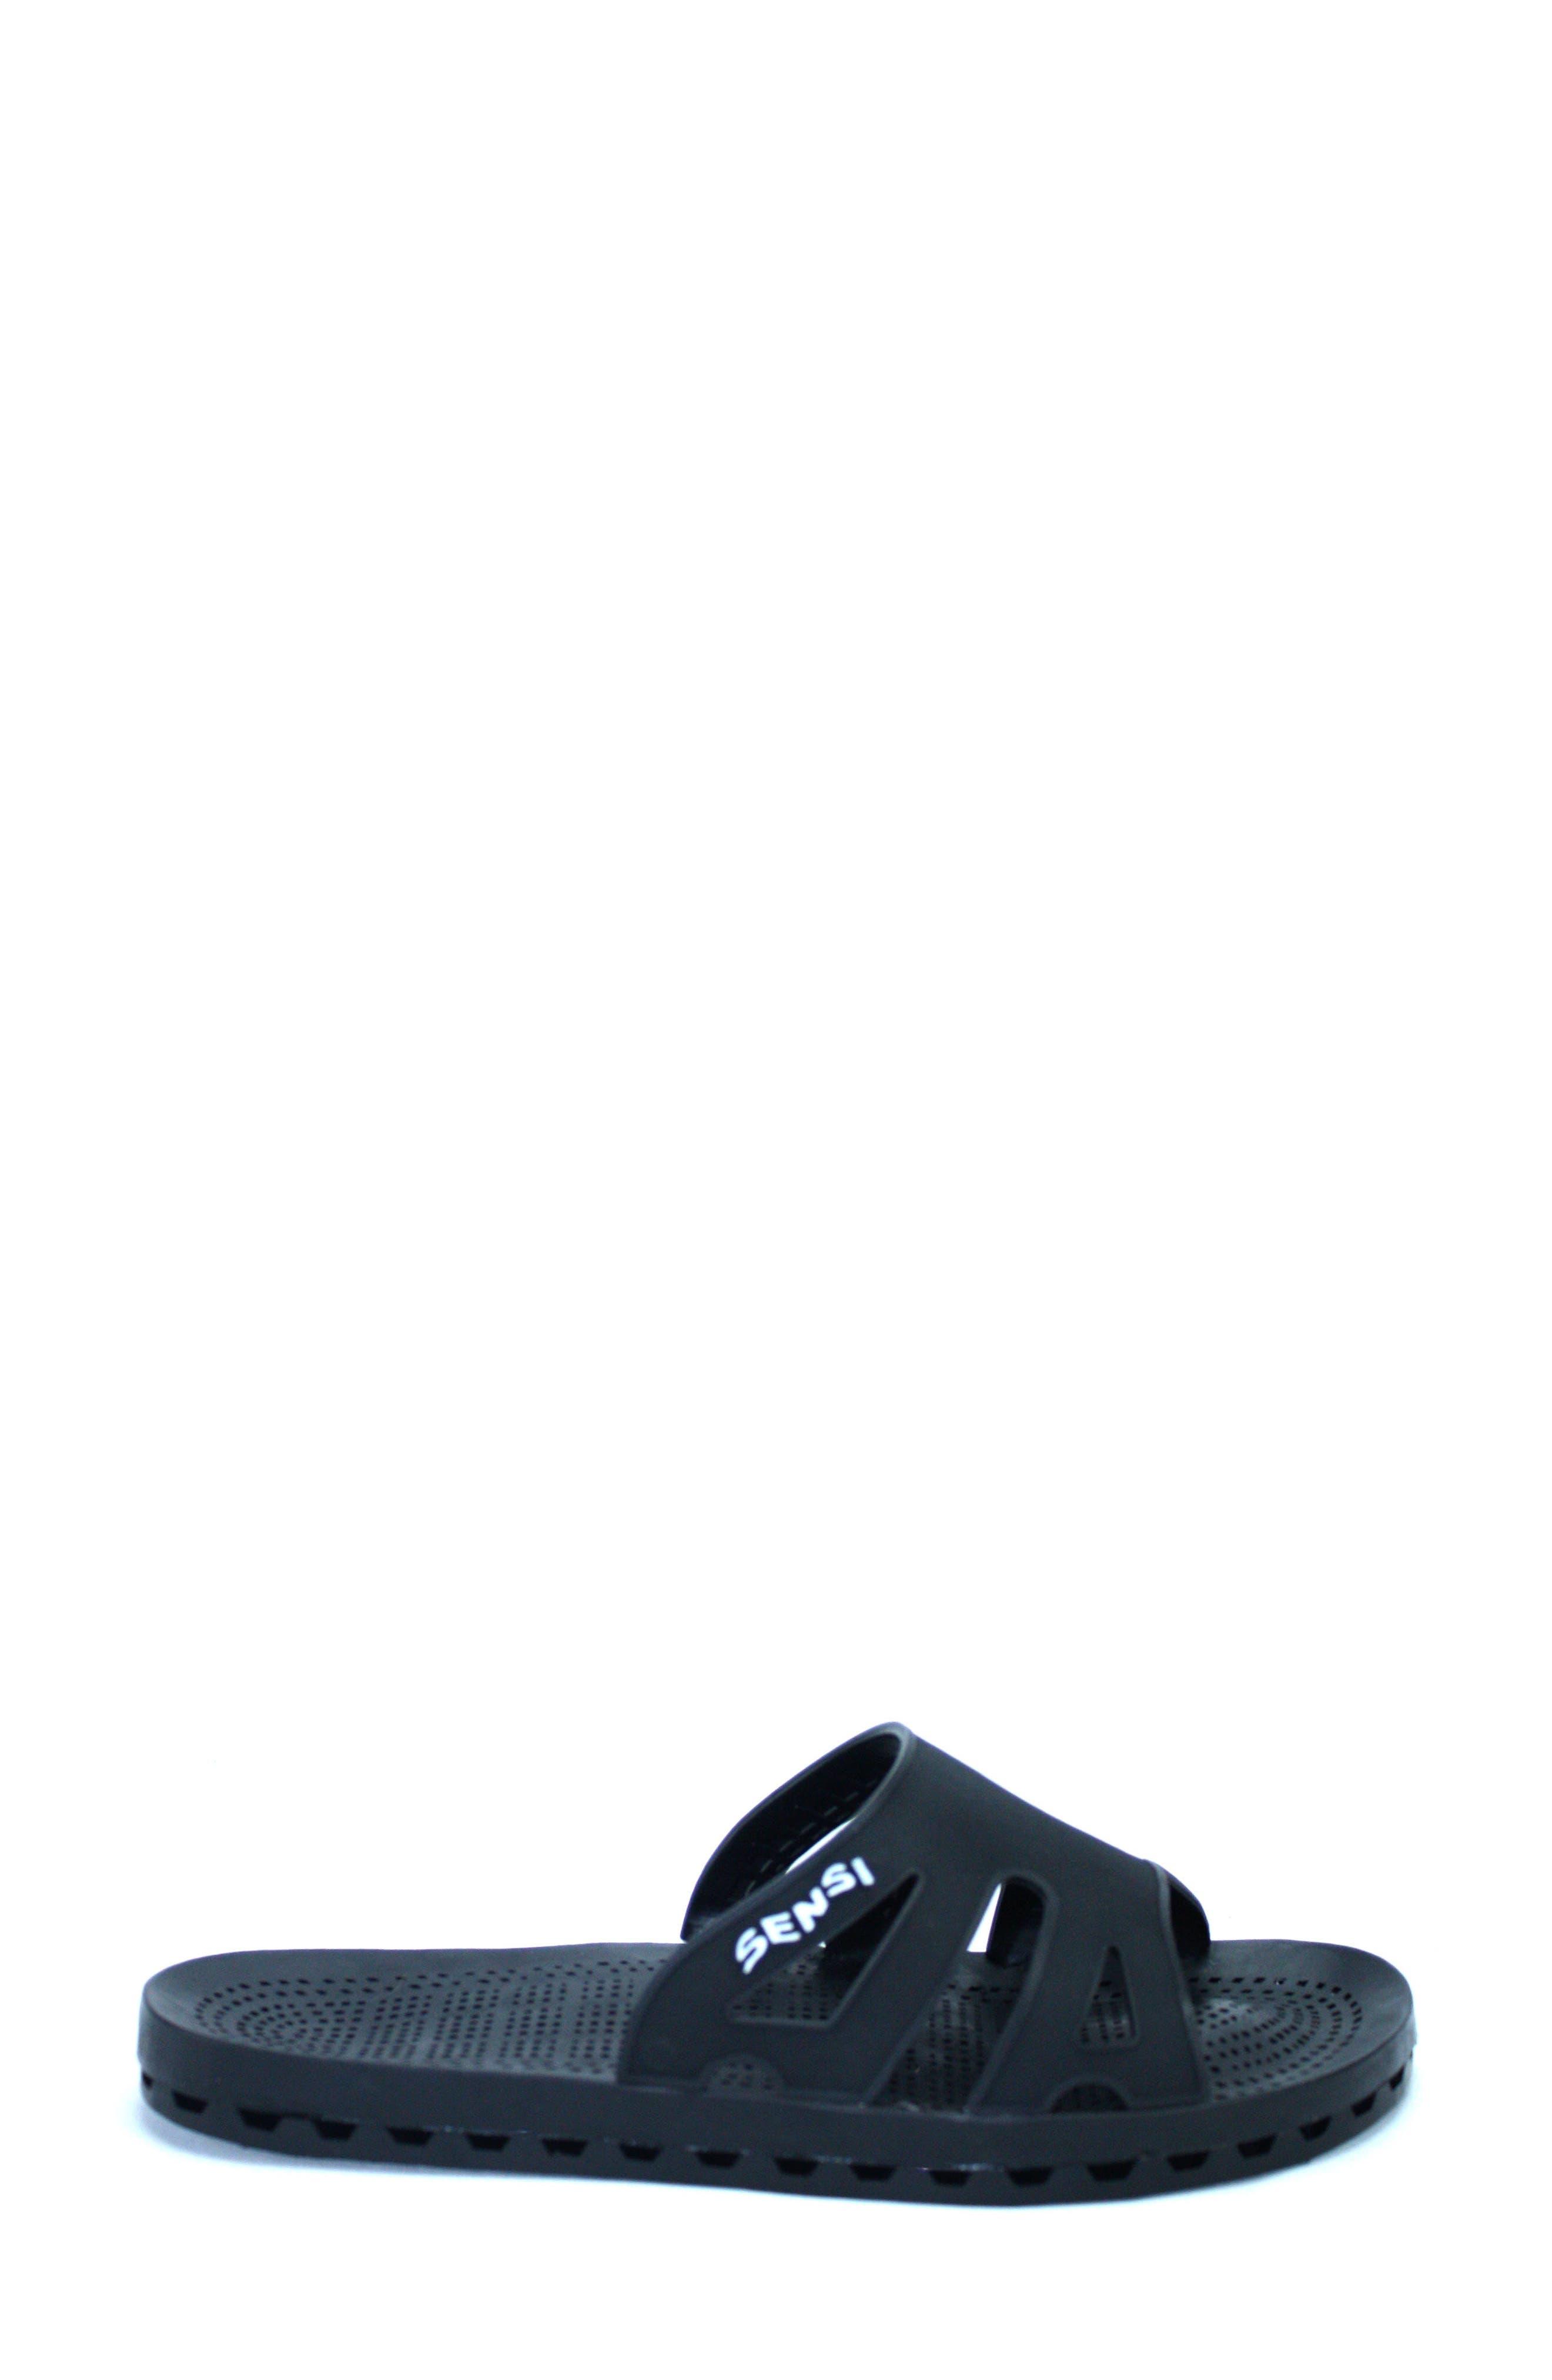 Regatta Slide Sandal,                             Alternate thumbnail 3, color,                             Solid Black Rubber